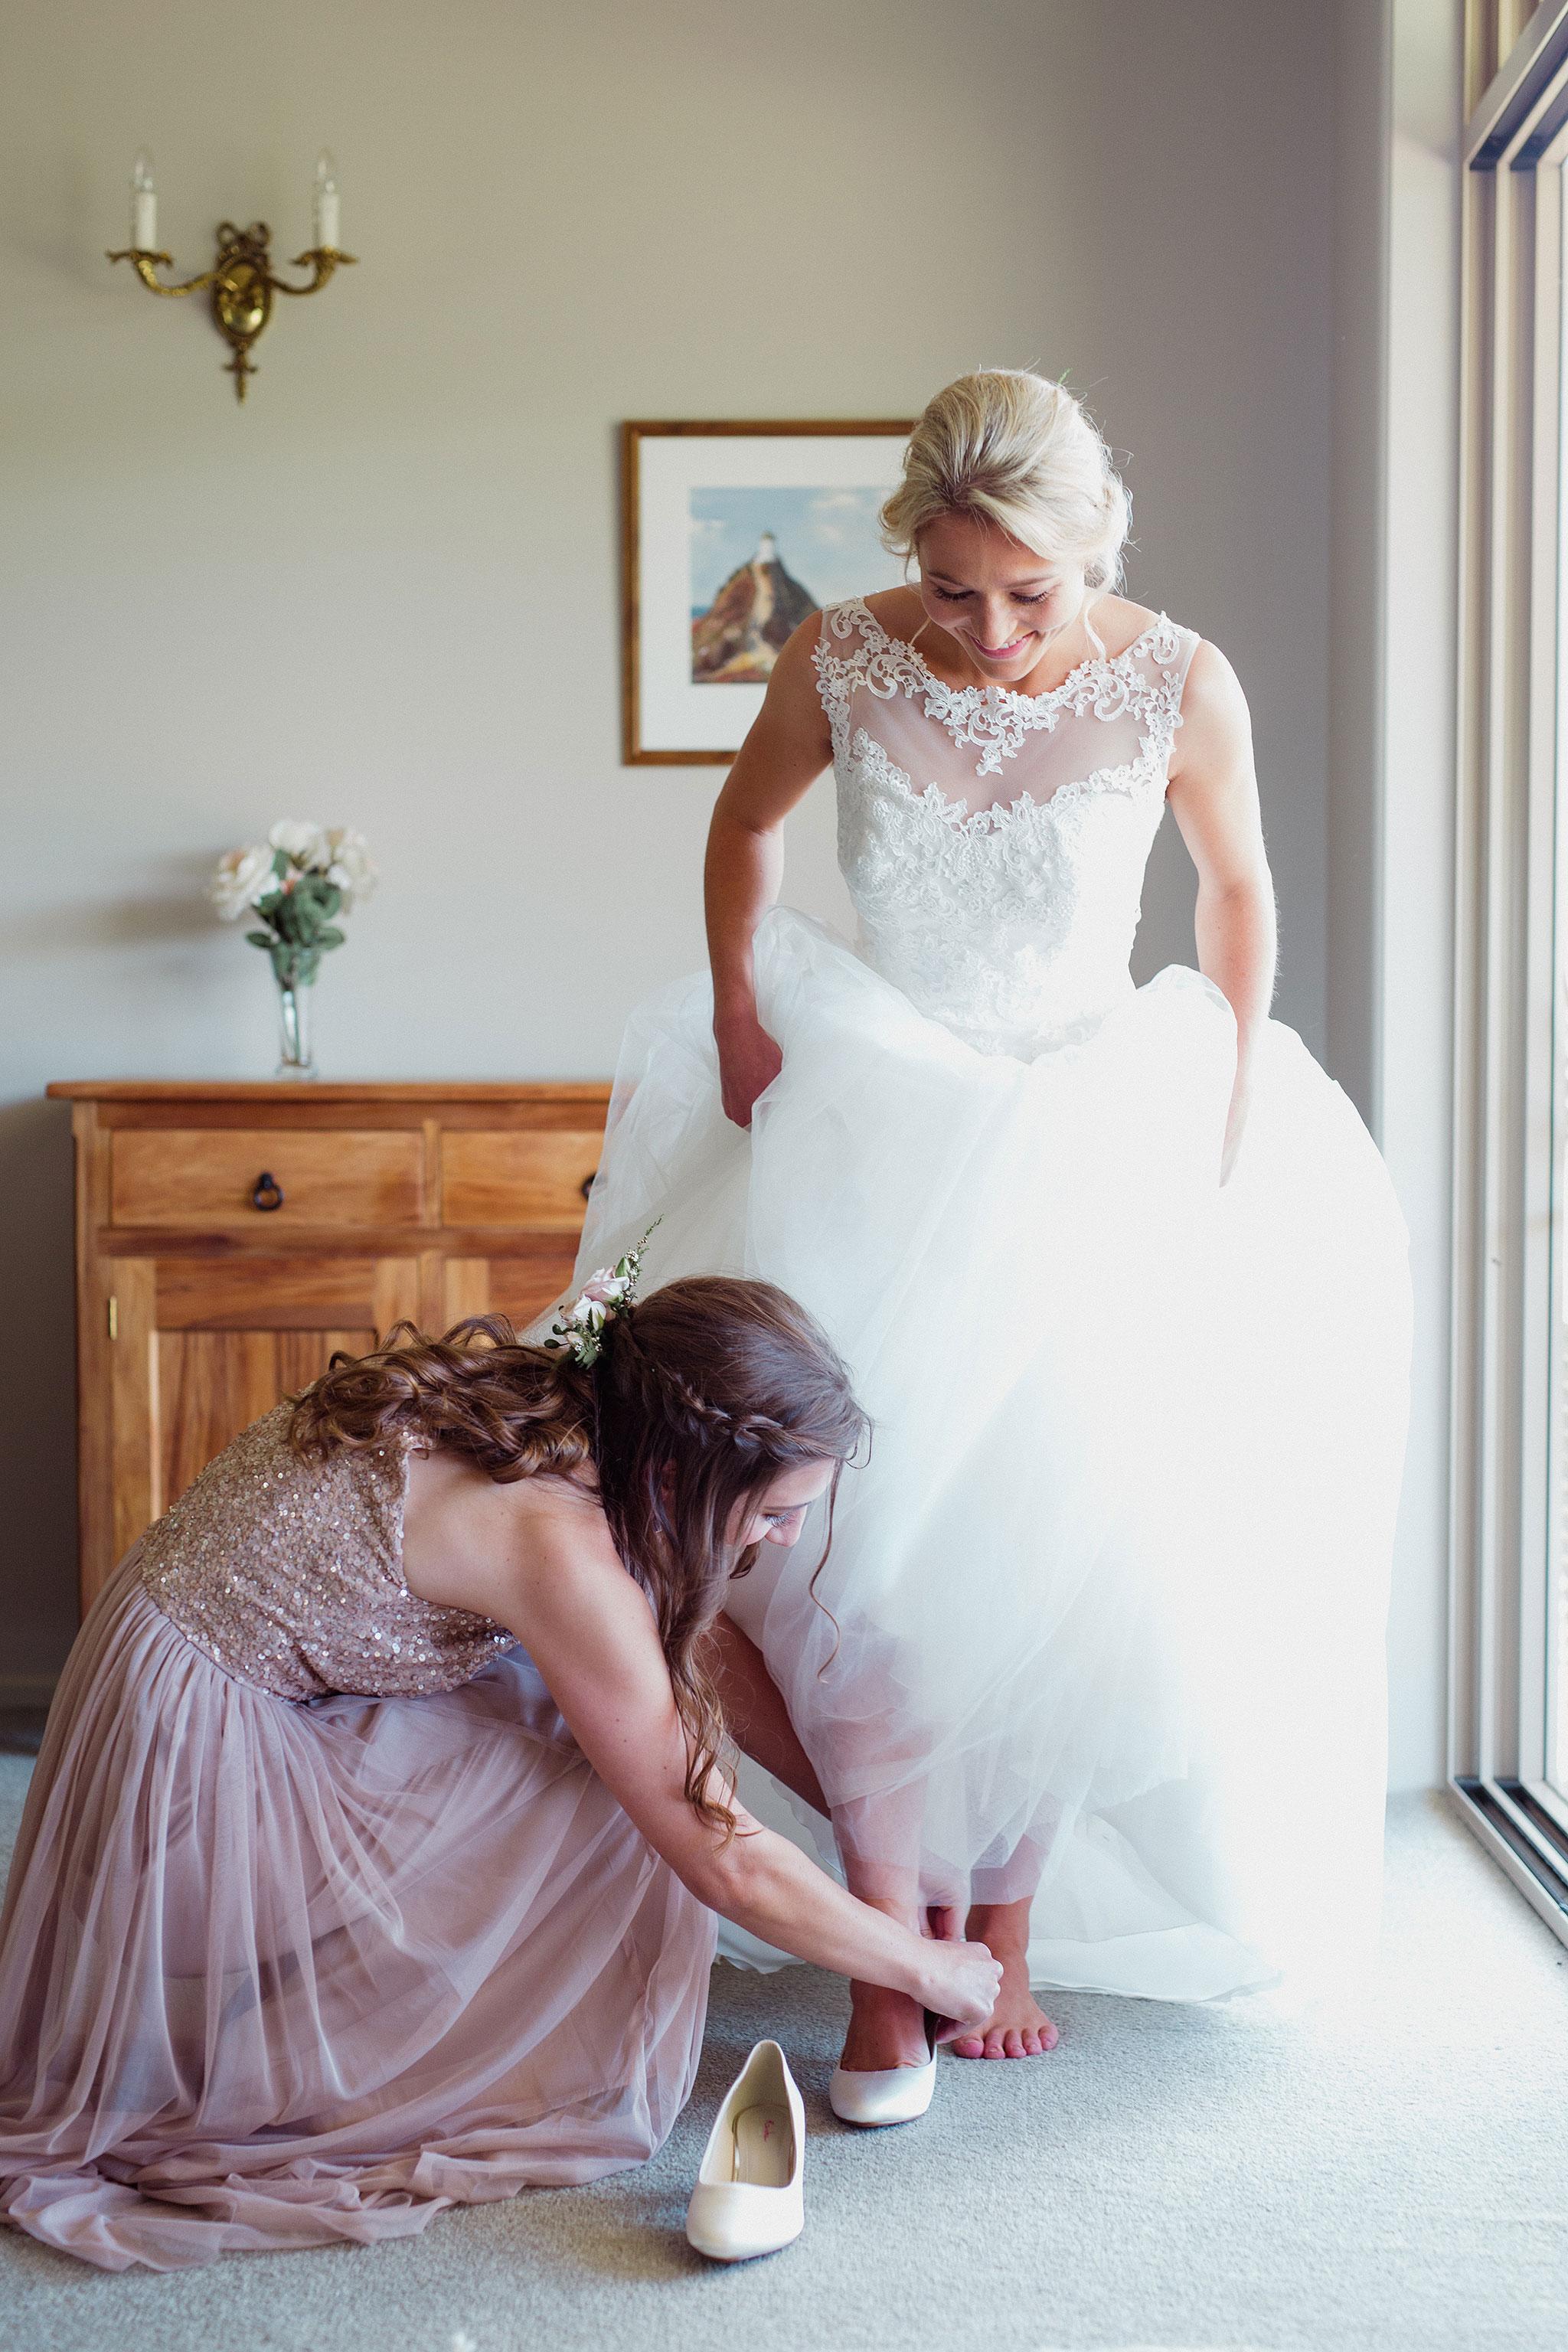 Bridal-Preparation-(35-of-43).jpg